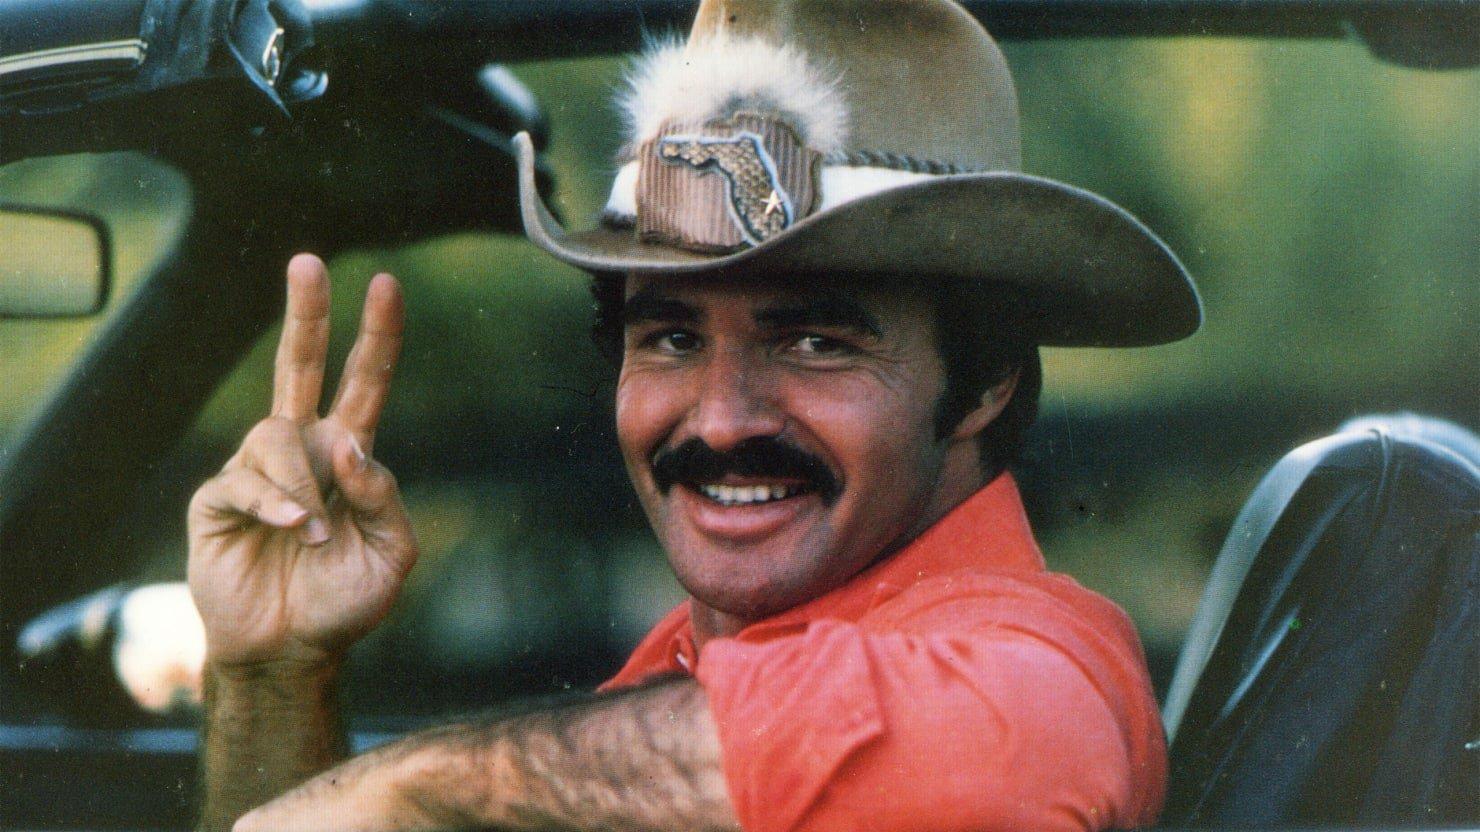 Happy Birthday to Burt Reynolds, who turns 82 today!